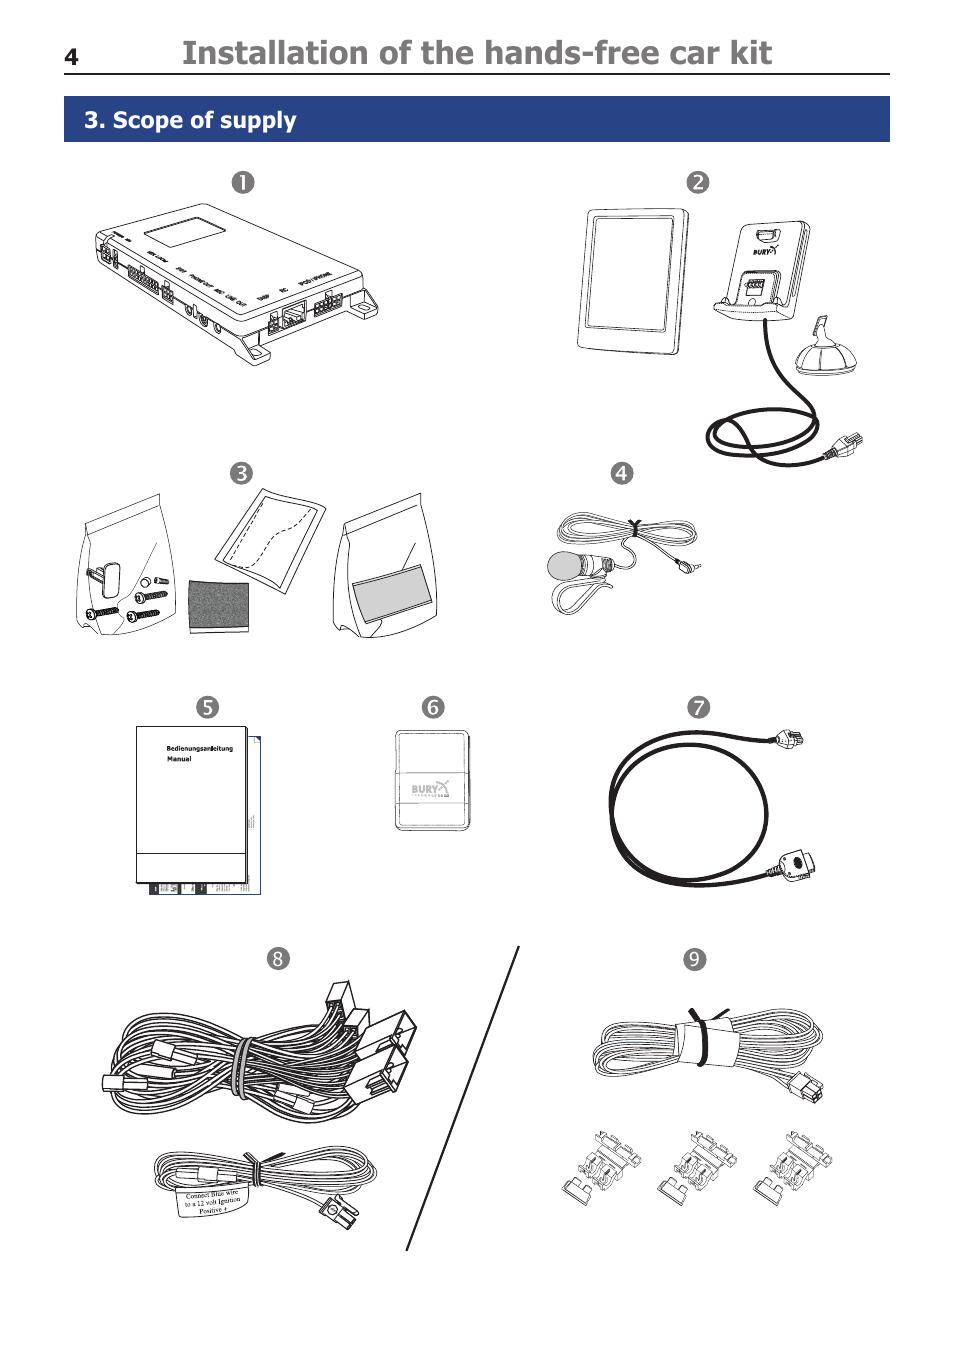 Bury cc 9060 music hands-free car kit with apple ipod / iphone.